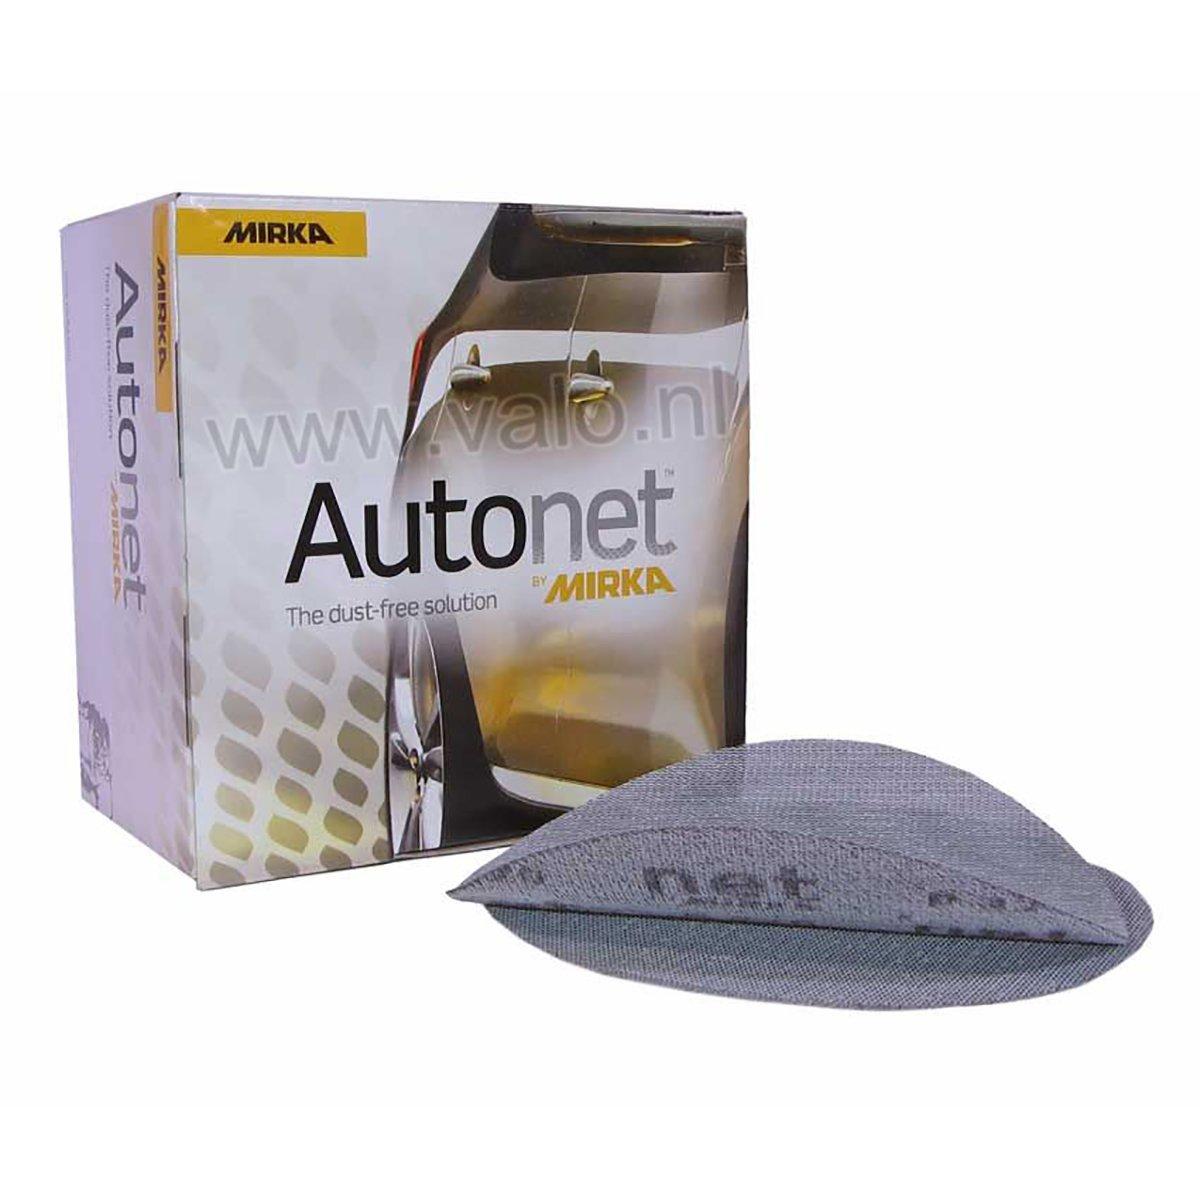 Mirka Autonet 400 Grit Wet/Dry Hook and Loop Mesh Sanding Discs - 50 Pack - Long Life Aluminum Oxide Disc - Dust-Free - Automotive or Woodworking